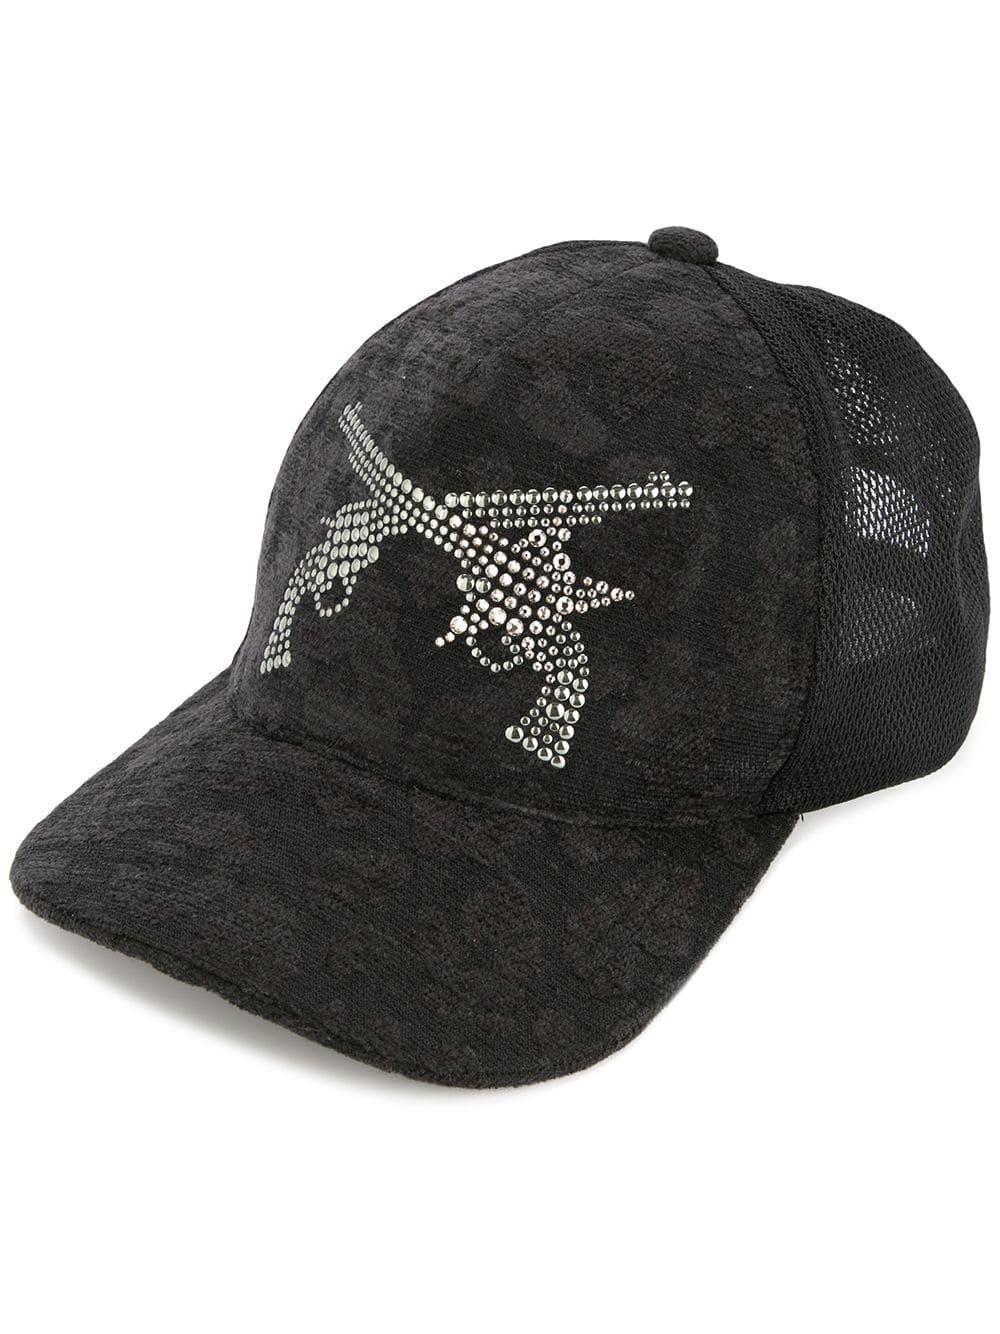 Roarguns Guns Embellished Cap - Black